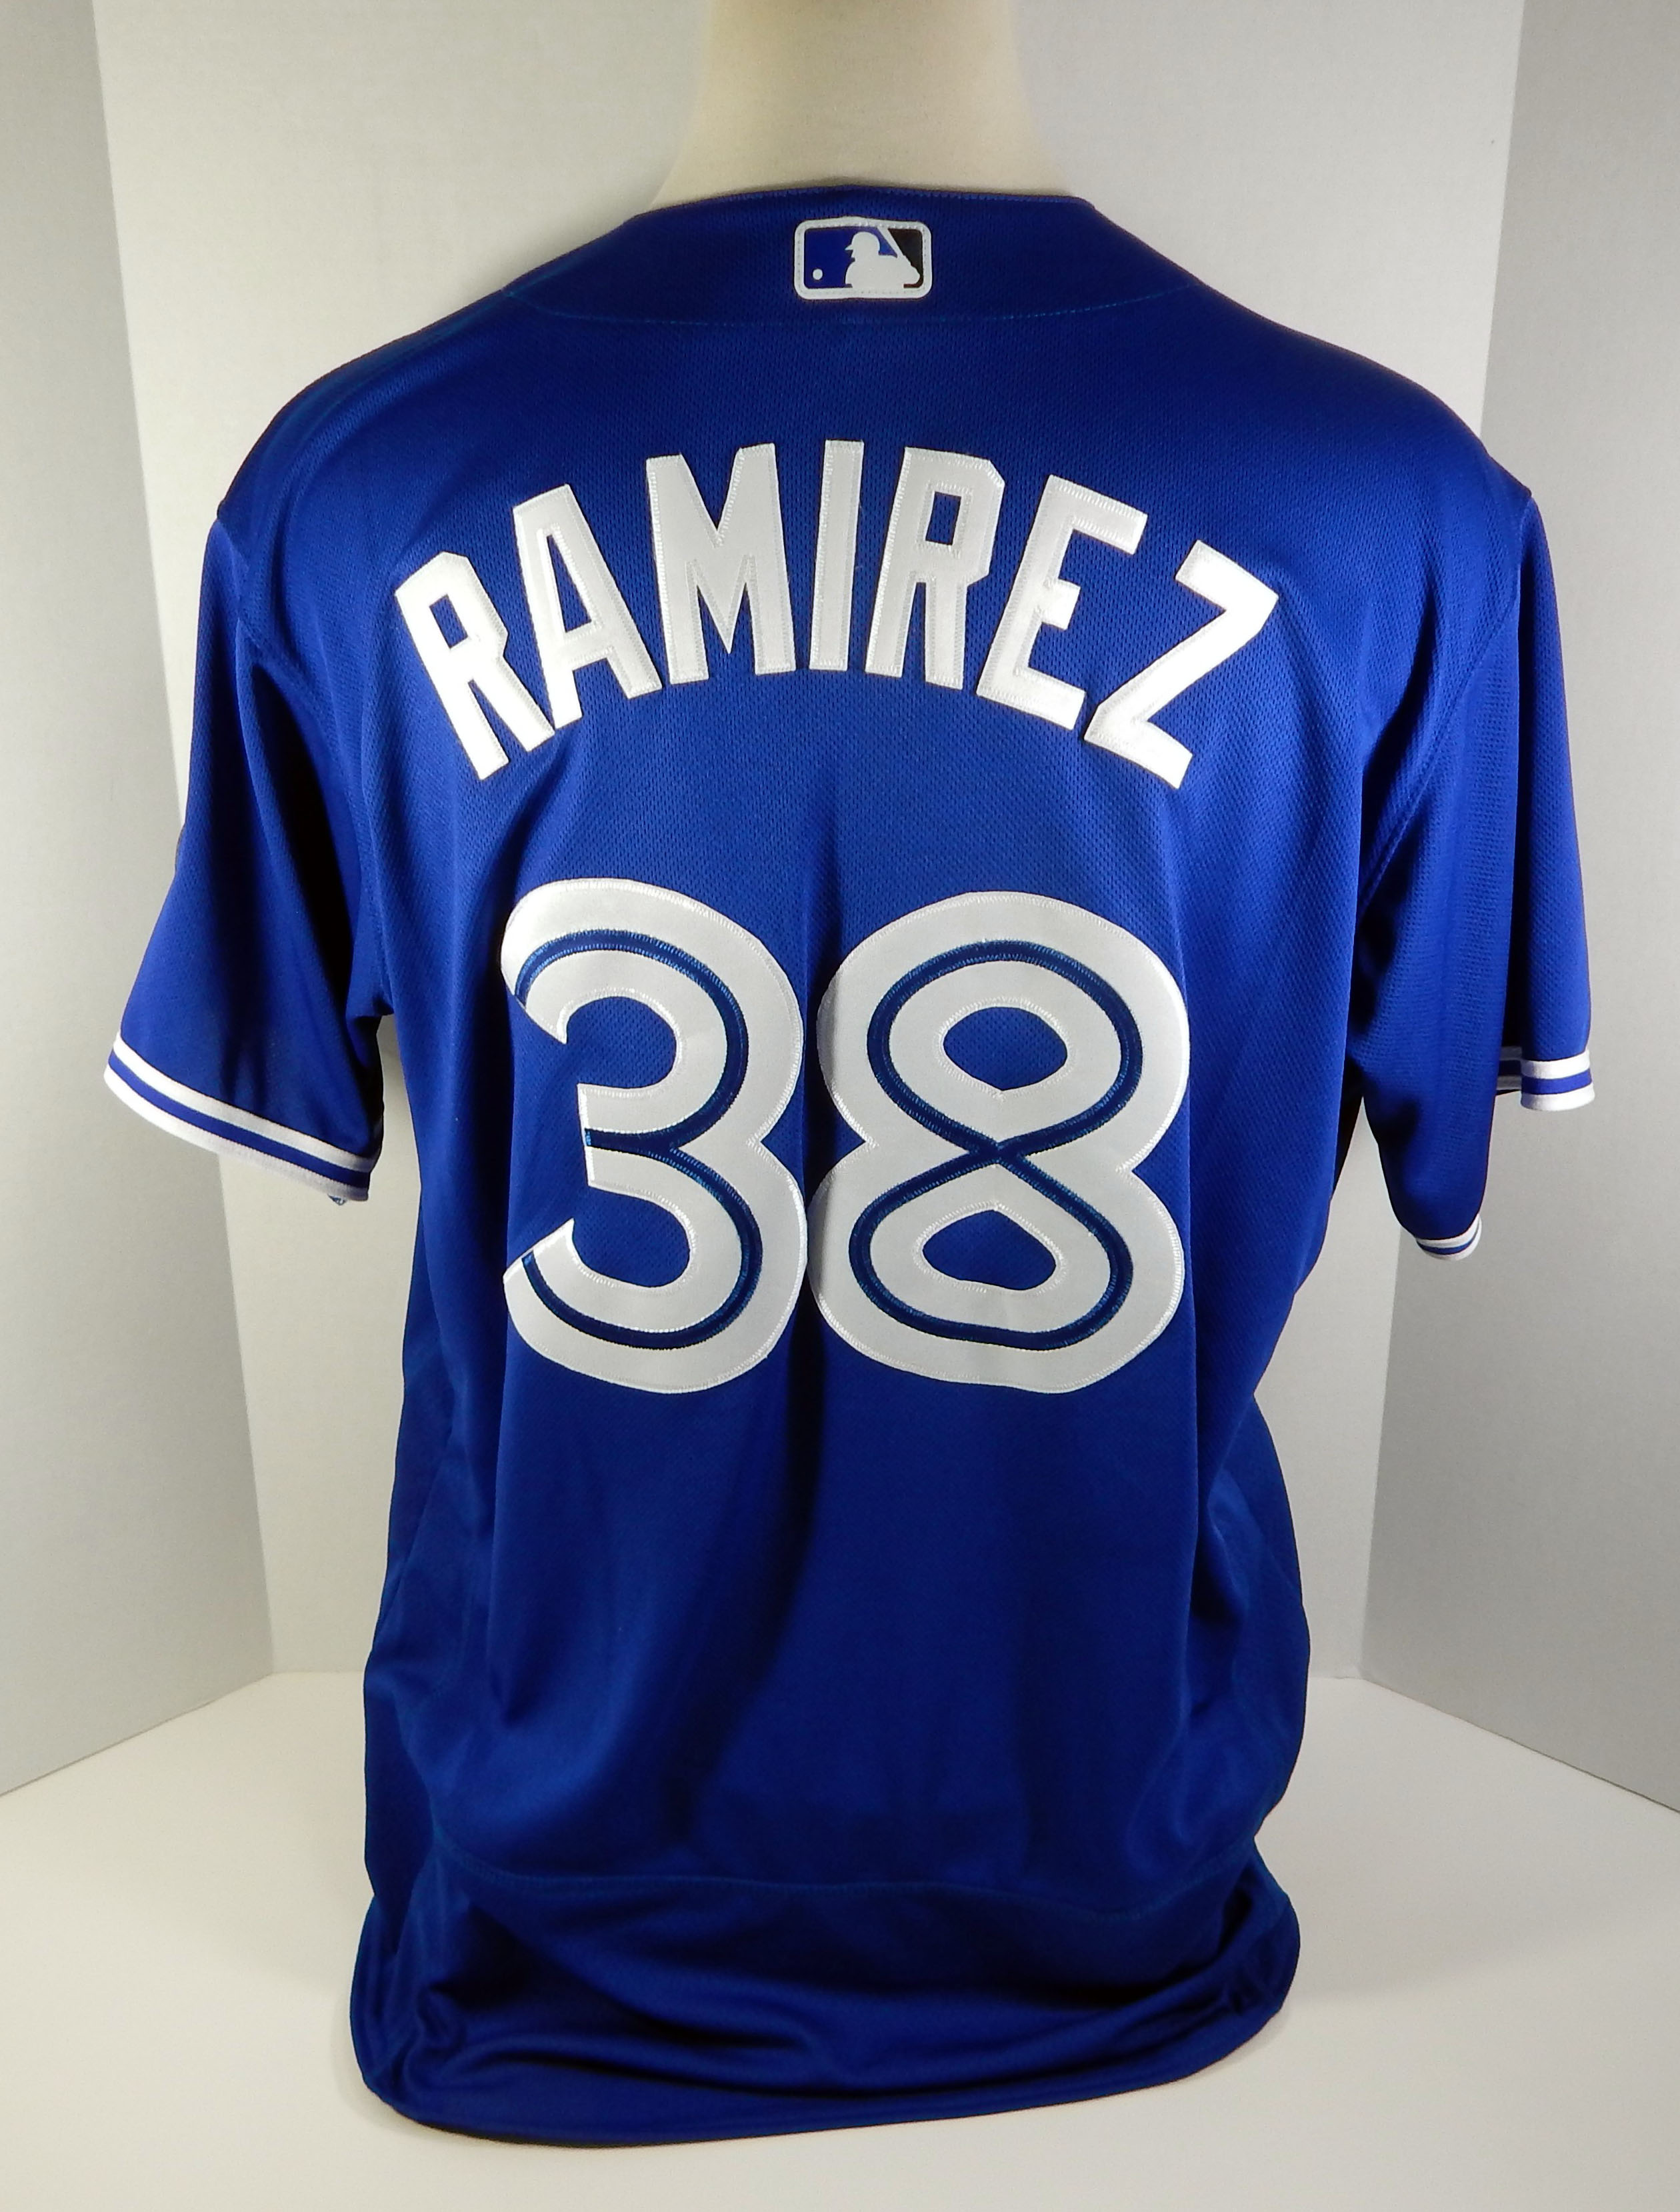 4d673f3b37f 2018 Toronto Blue Jays Carlos Ramirez  38 Game Issued Blue Jersey 32 ...